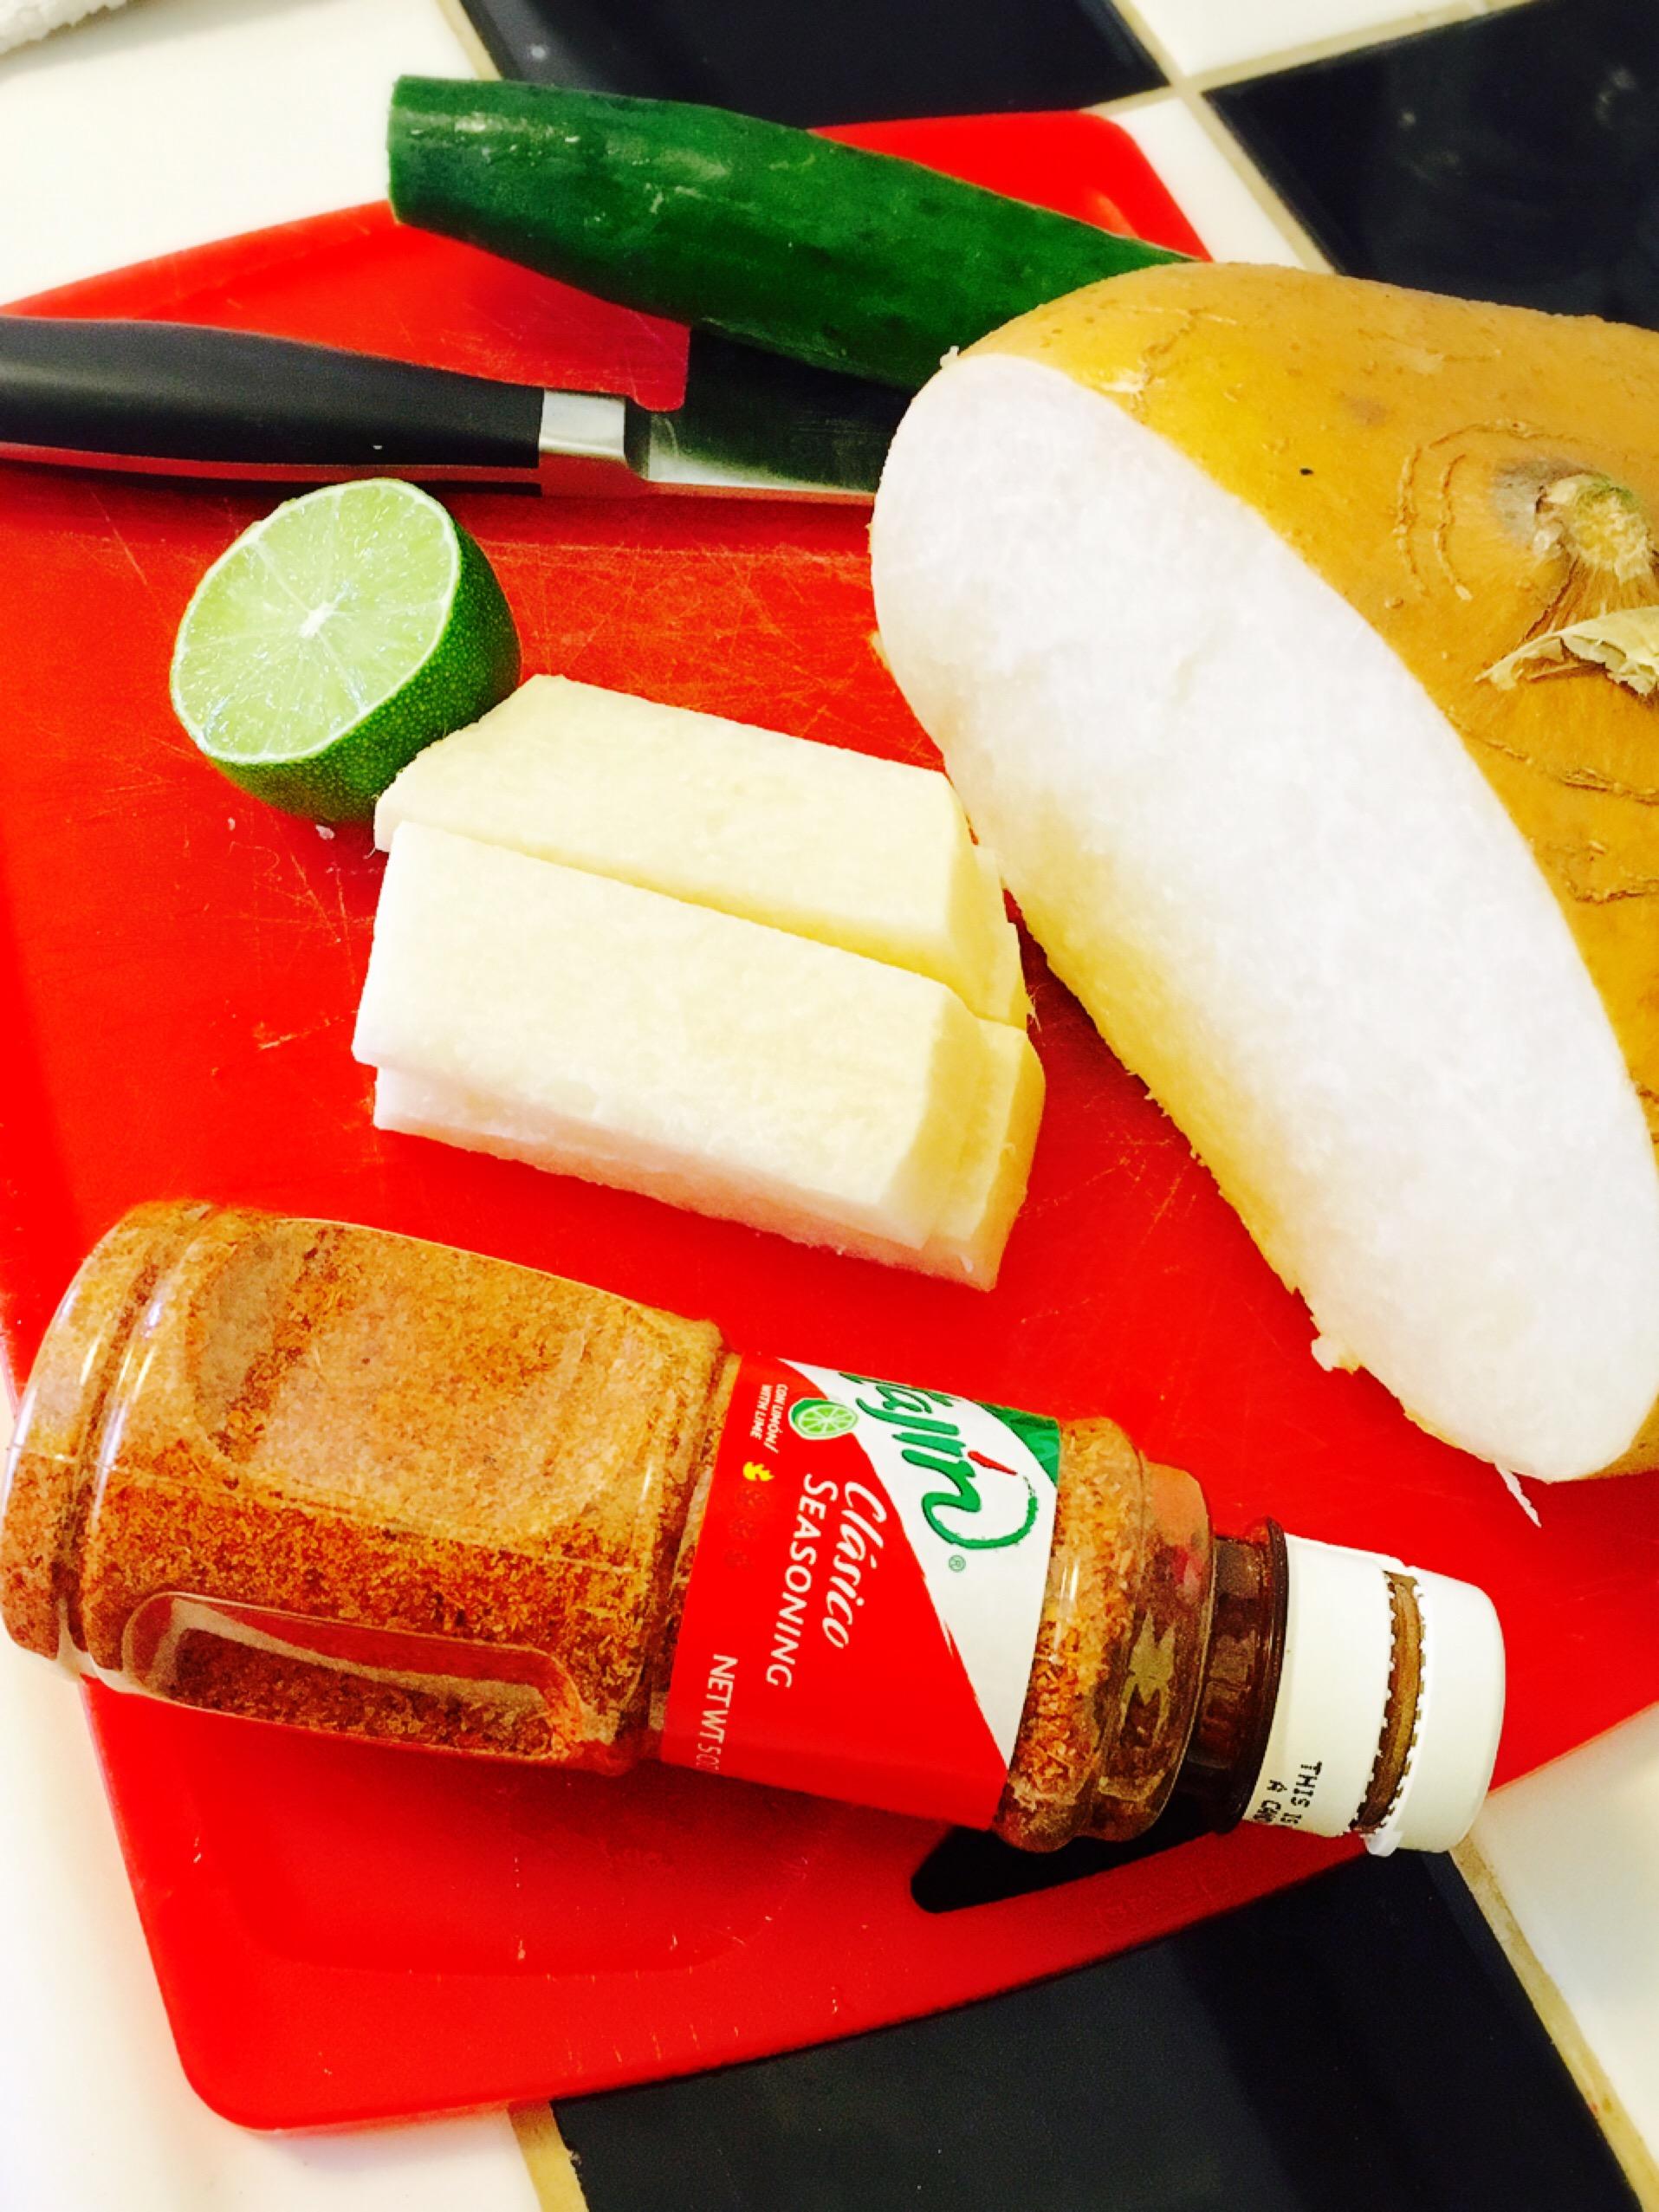 Jicama Tajin Salad ingredients